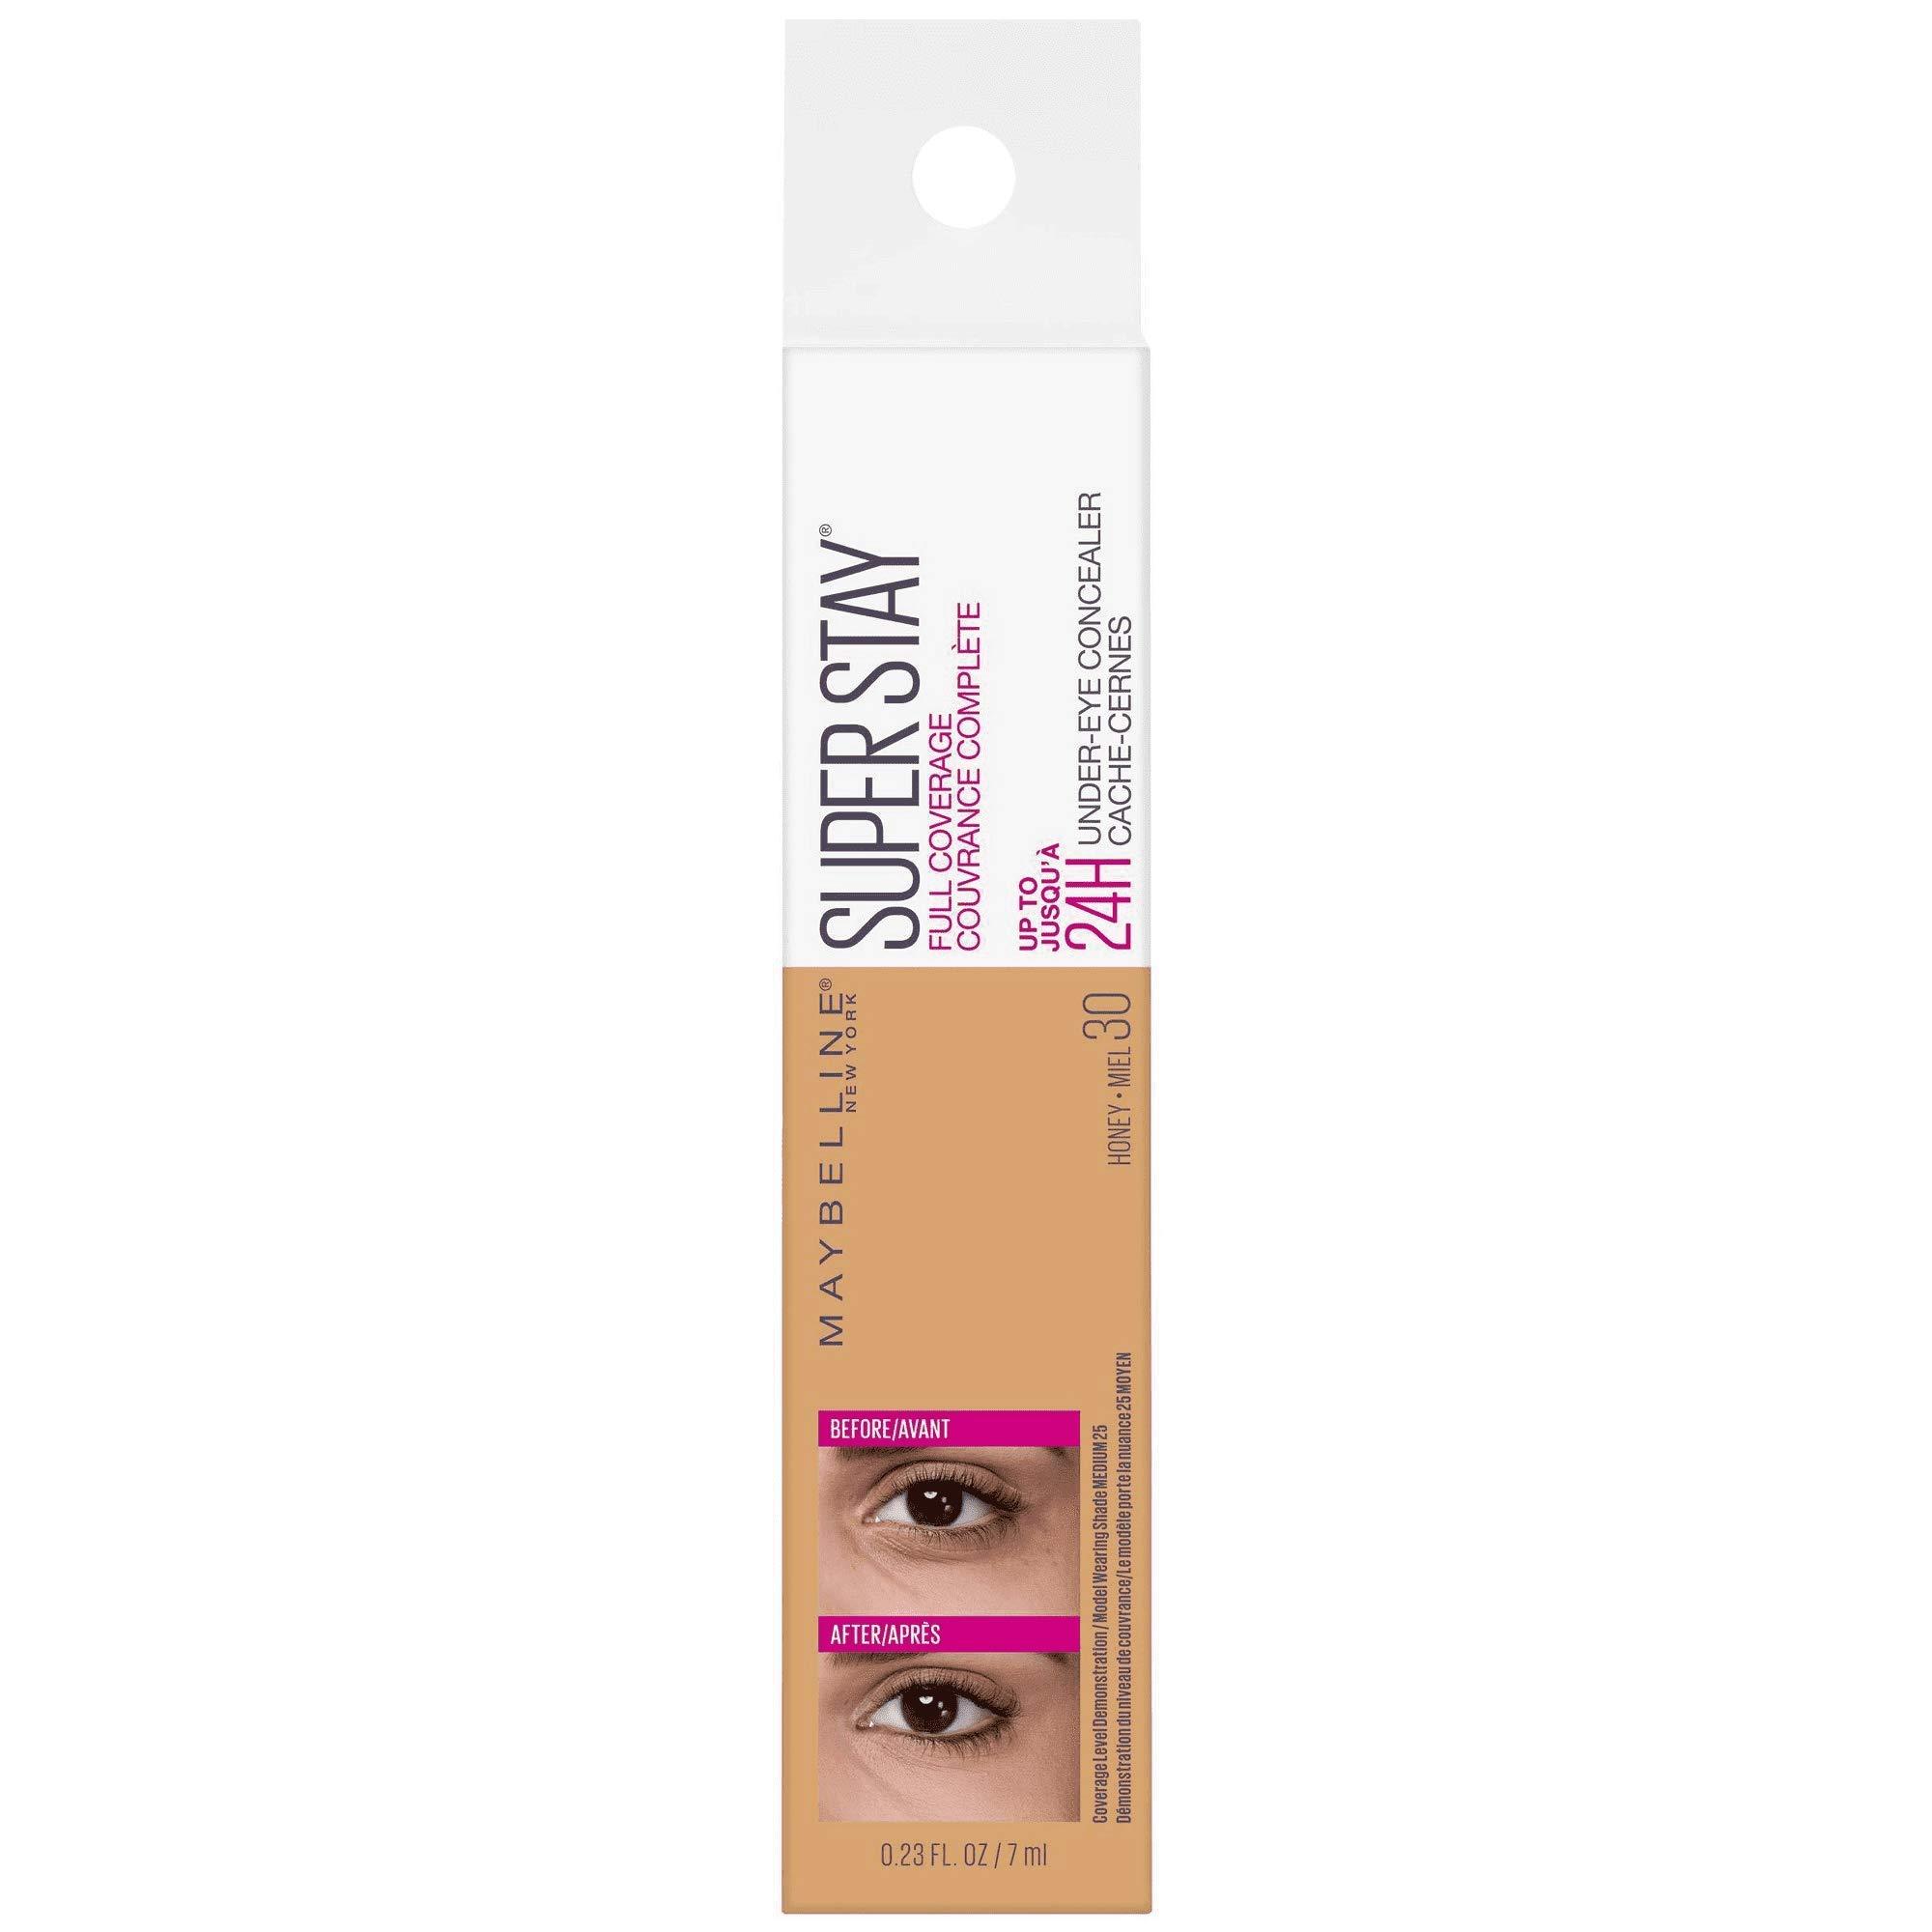 Super Stay Full Coverage Long Lasting Under-Eye Concealer, 30 Honey, 0.23 fl oz (Pack of 2)